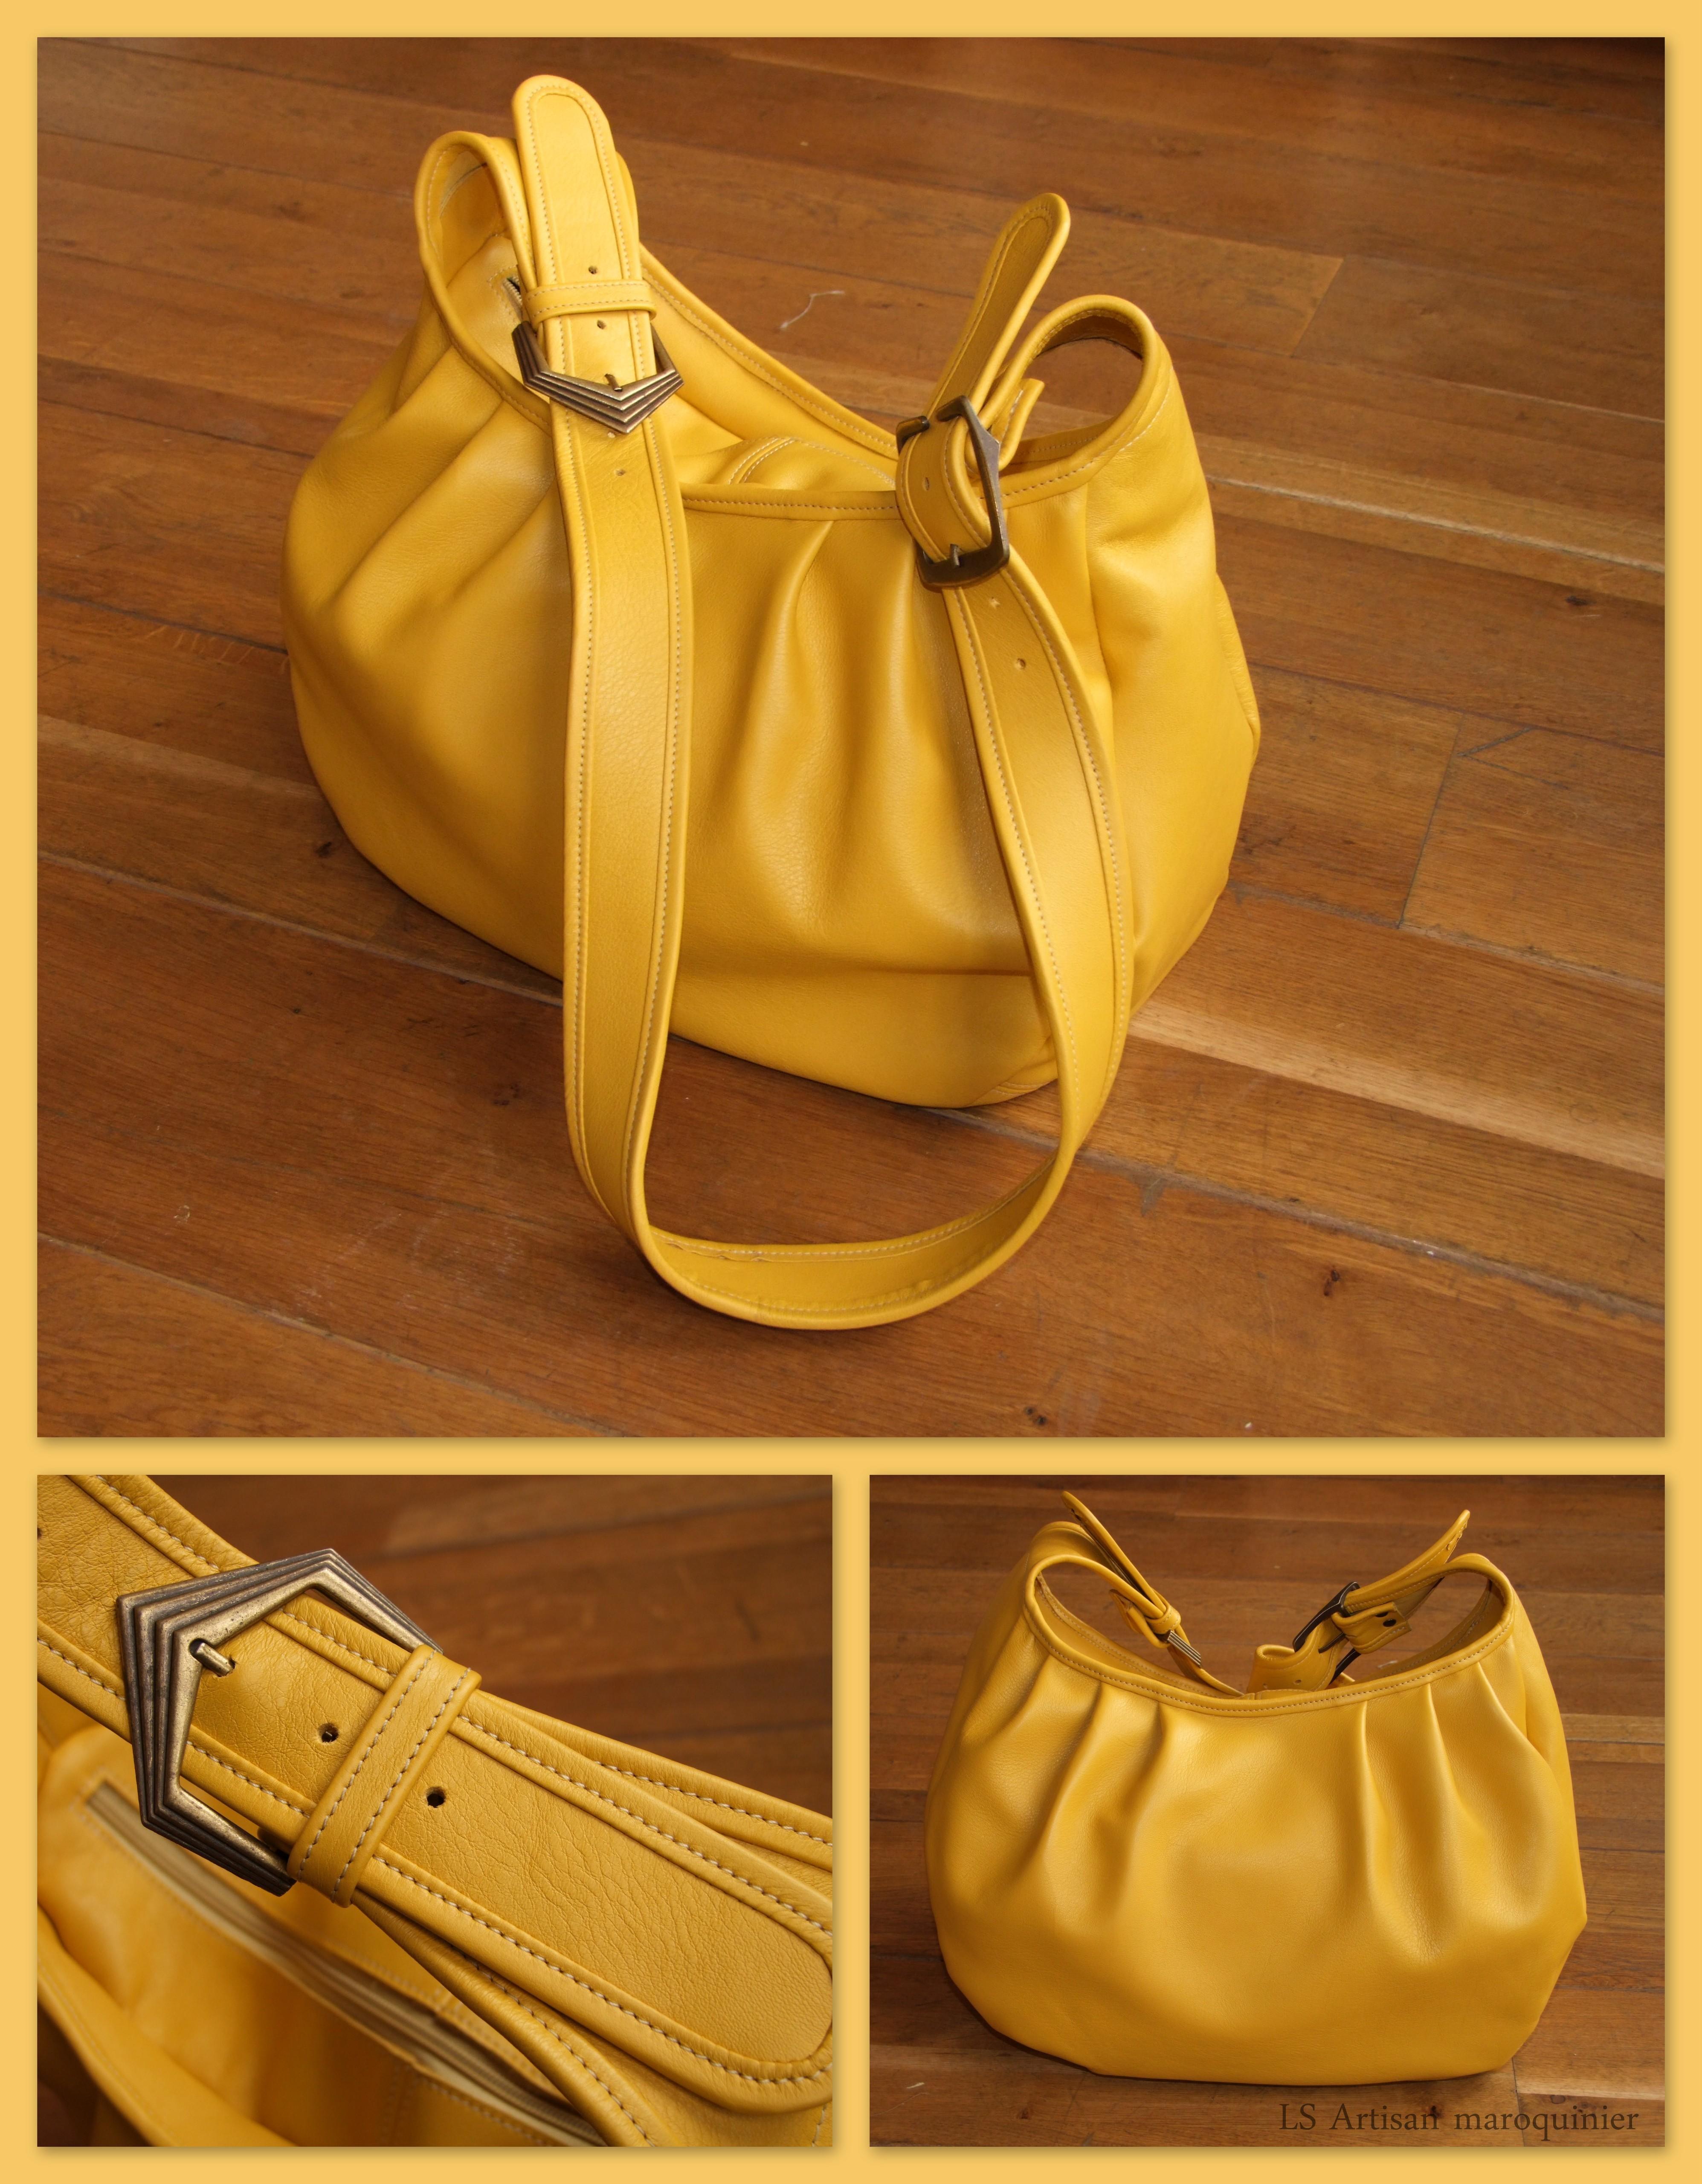 maroquinerie sur mesure le cuir sur mesure sac ceinture pochette ipad ls. Black Bedroom Furniture Sets. Home Design Ideas